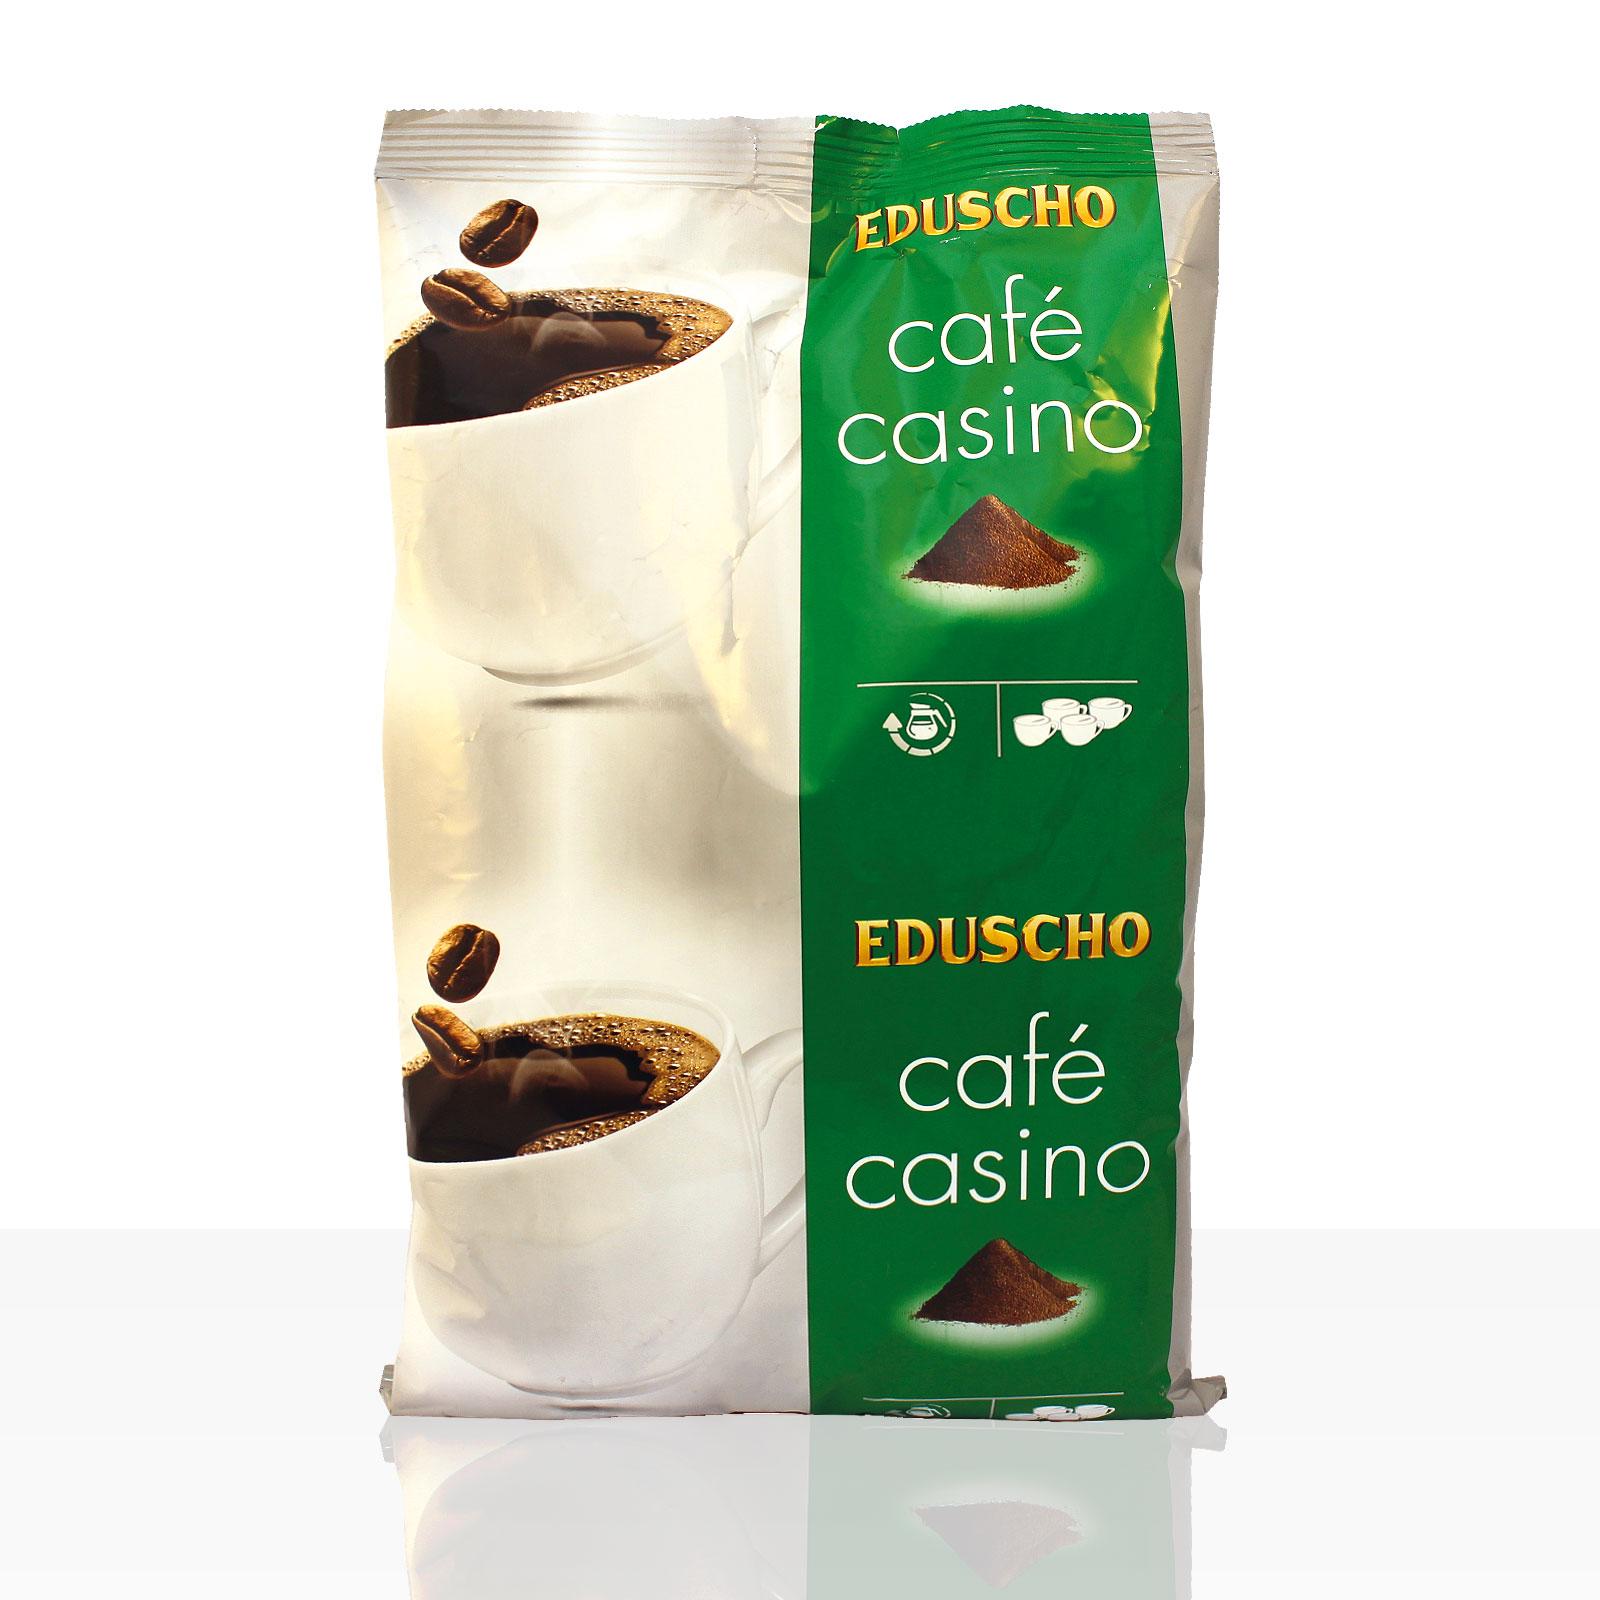 Tchibo / Eduscho Cafe Casino Plus - 16 x 500g Kaffee gemahlen, Filterkaffee